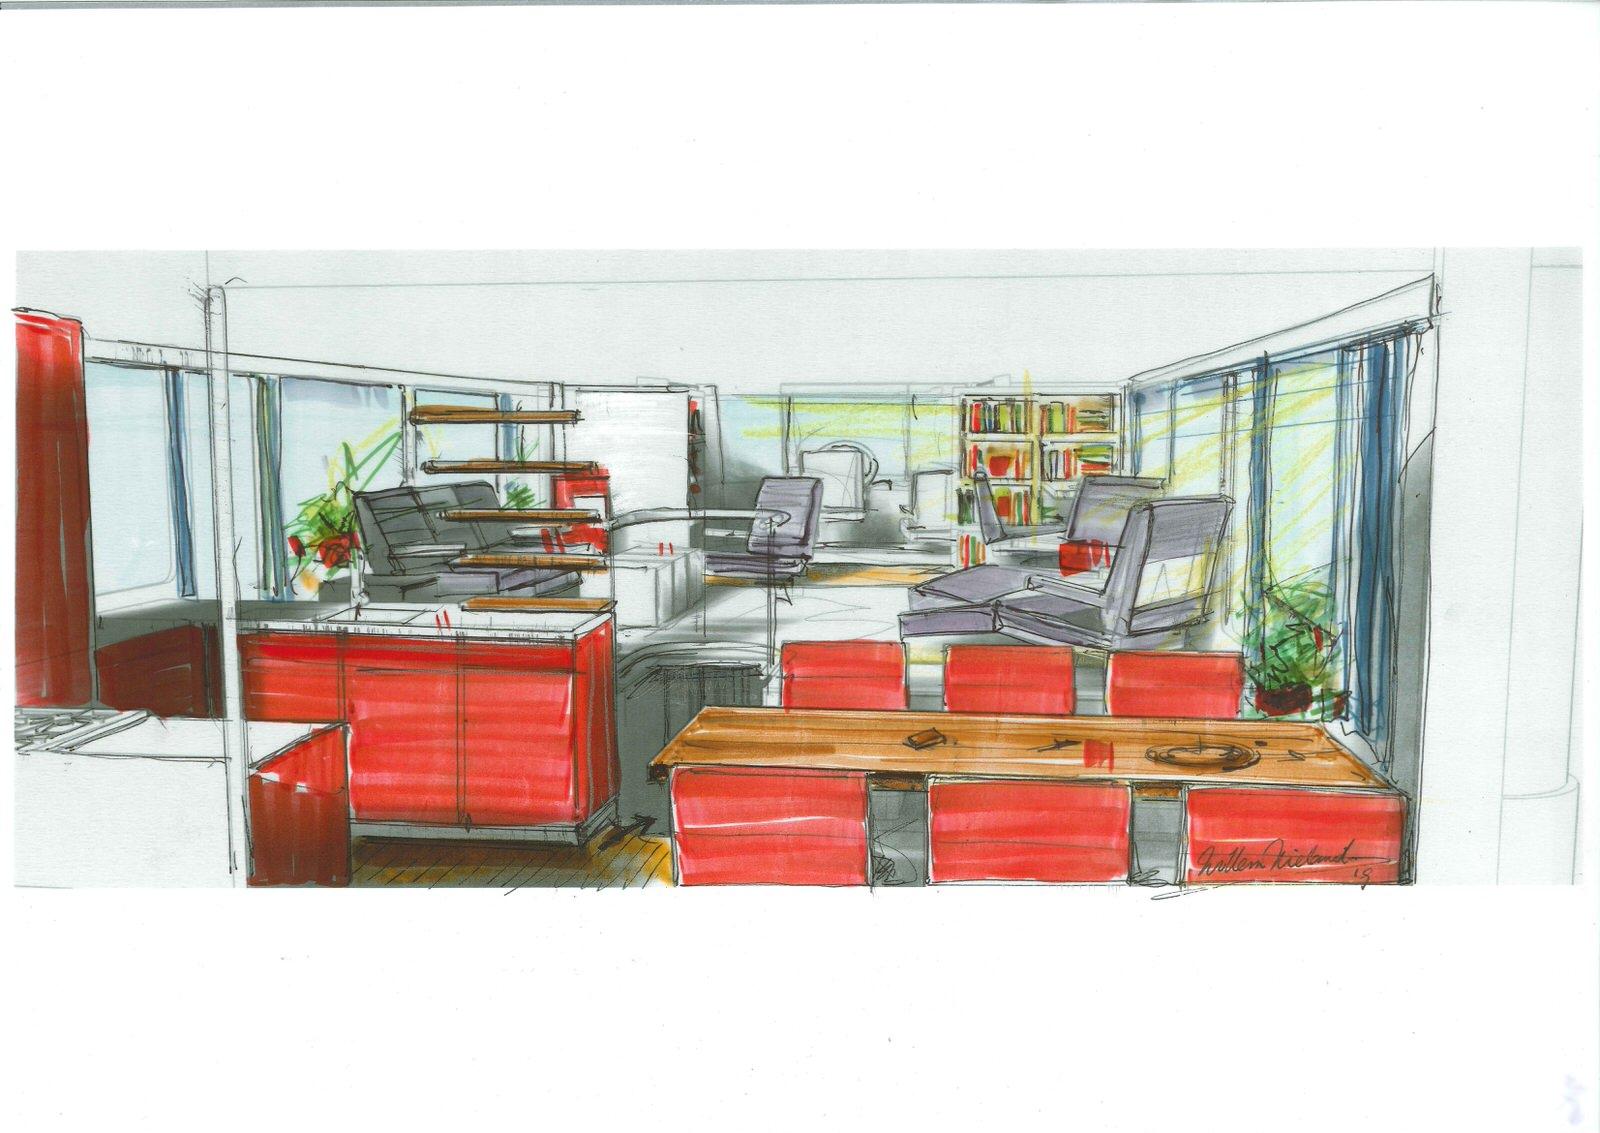 CRUISE SHIP side 15 Nieland Design HUIZEN010